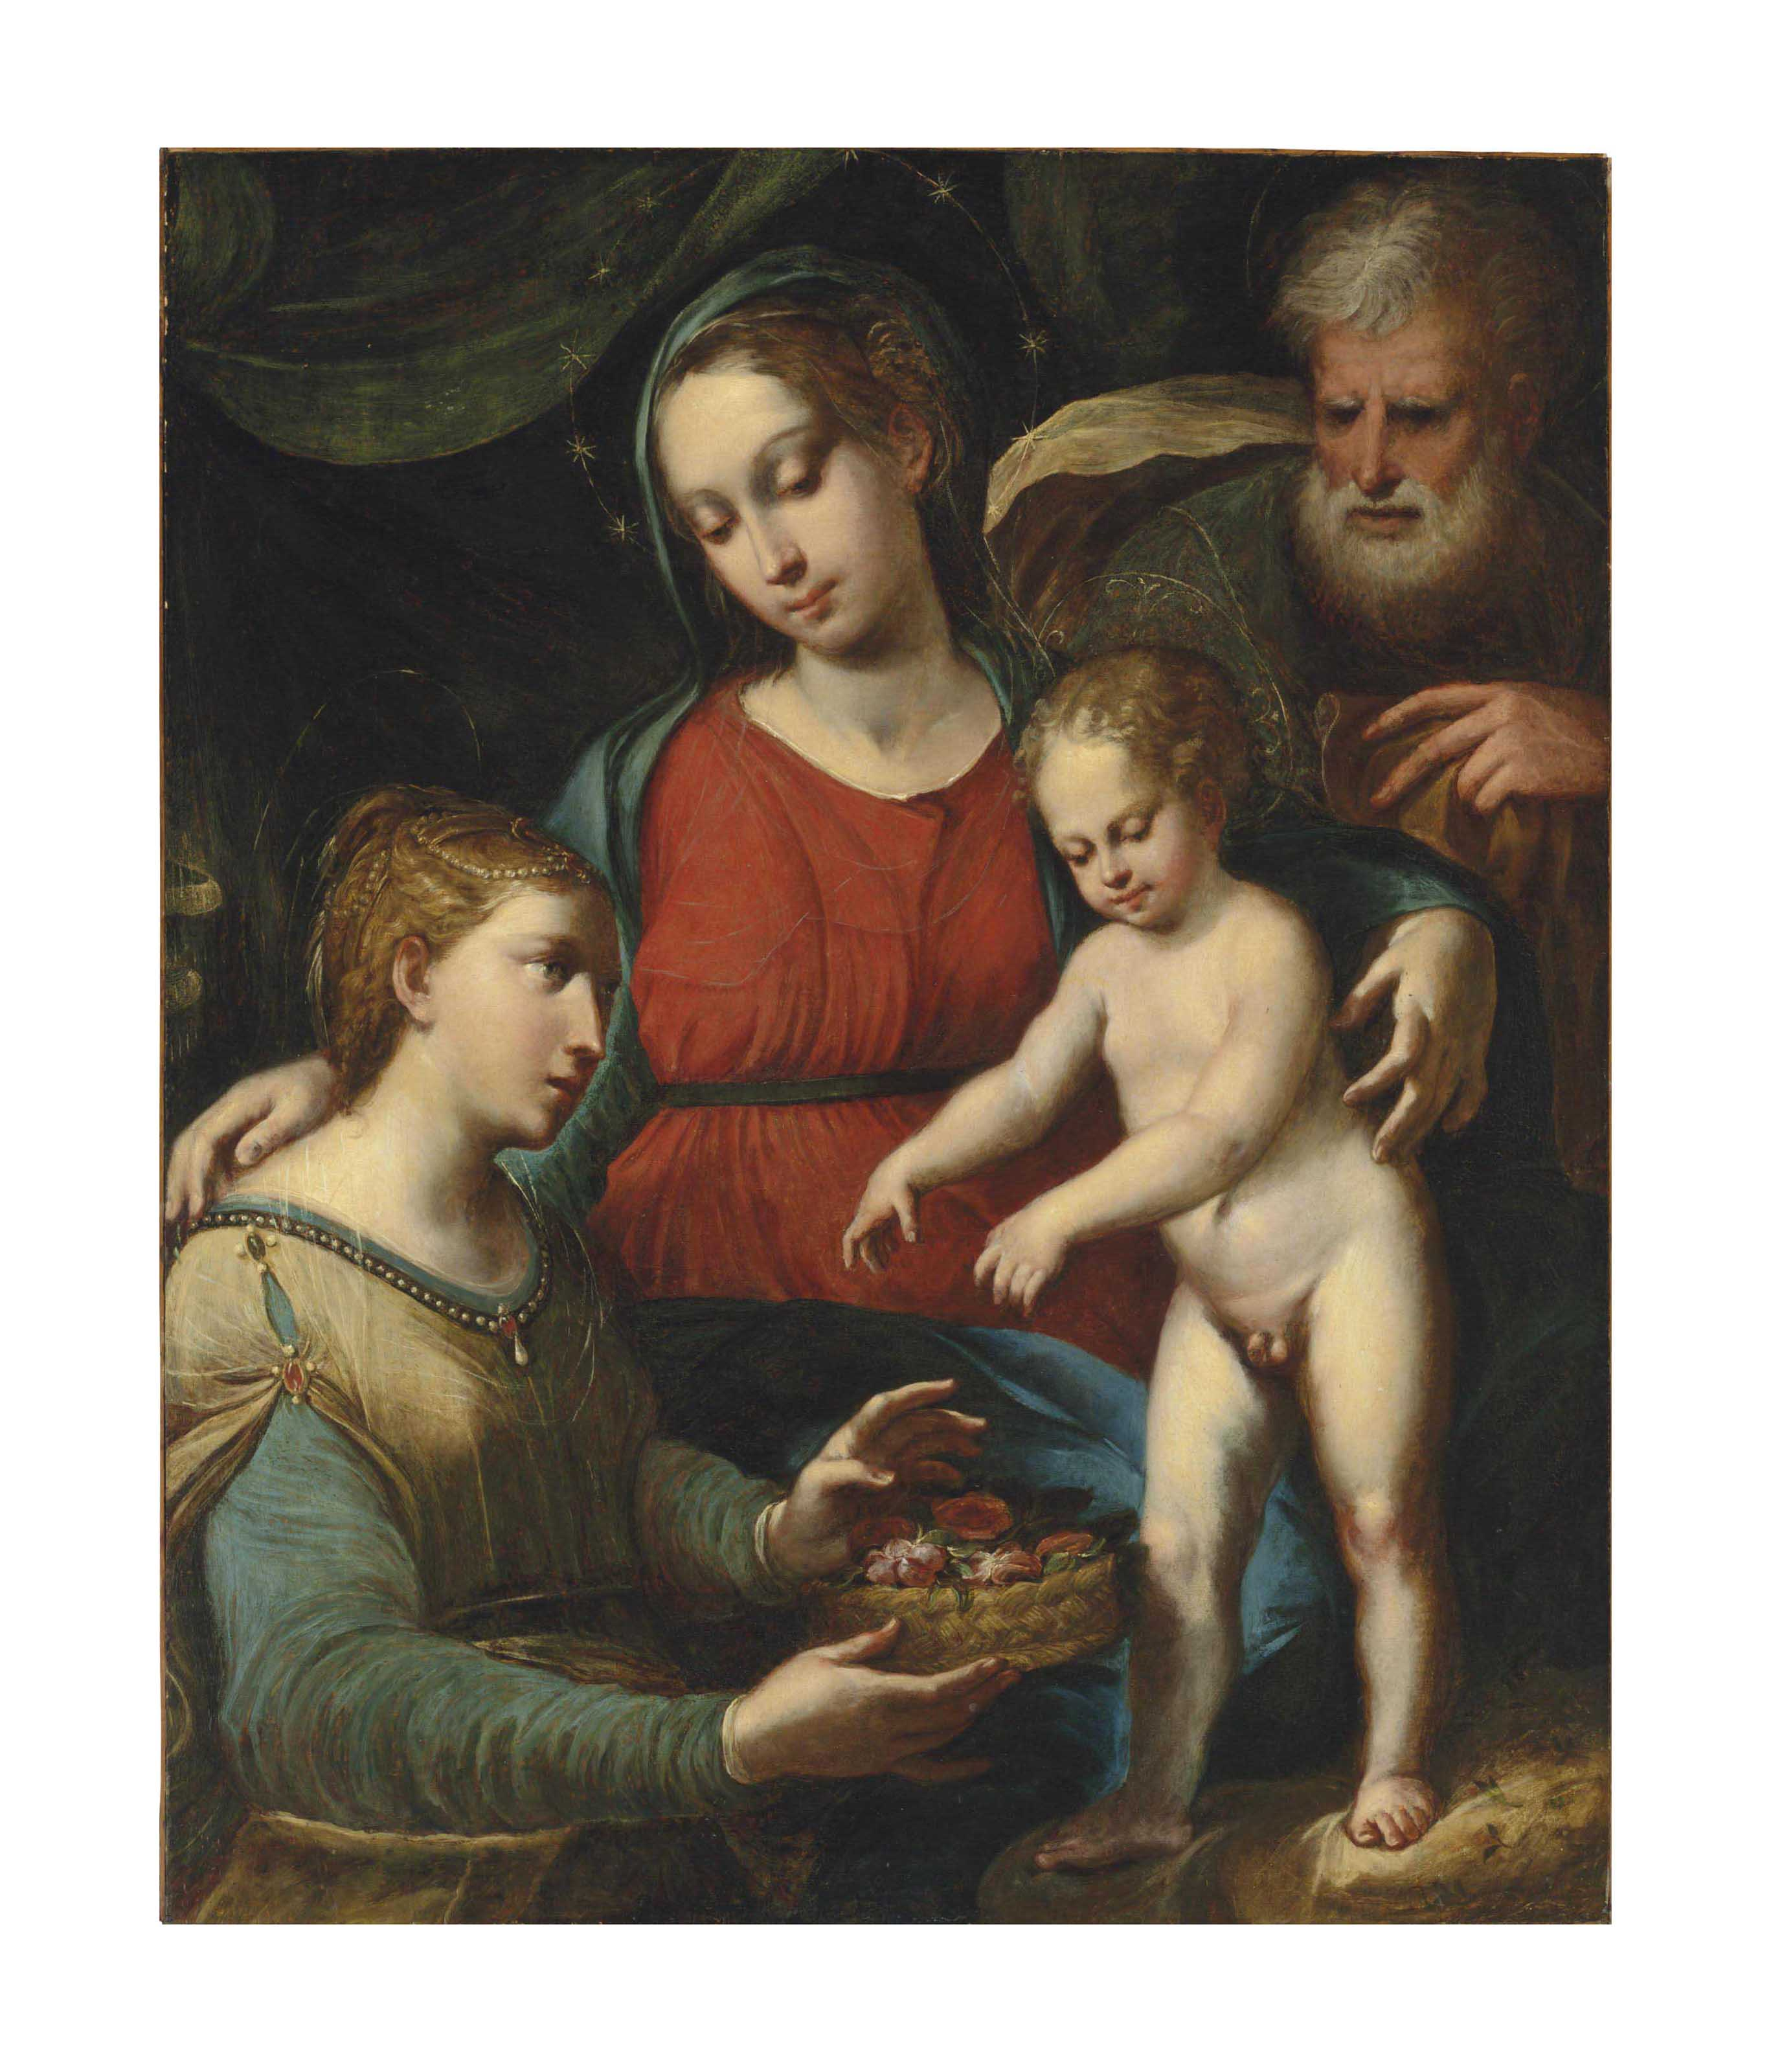 Circle of Girolamo Pennacchi,